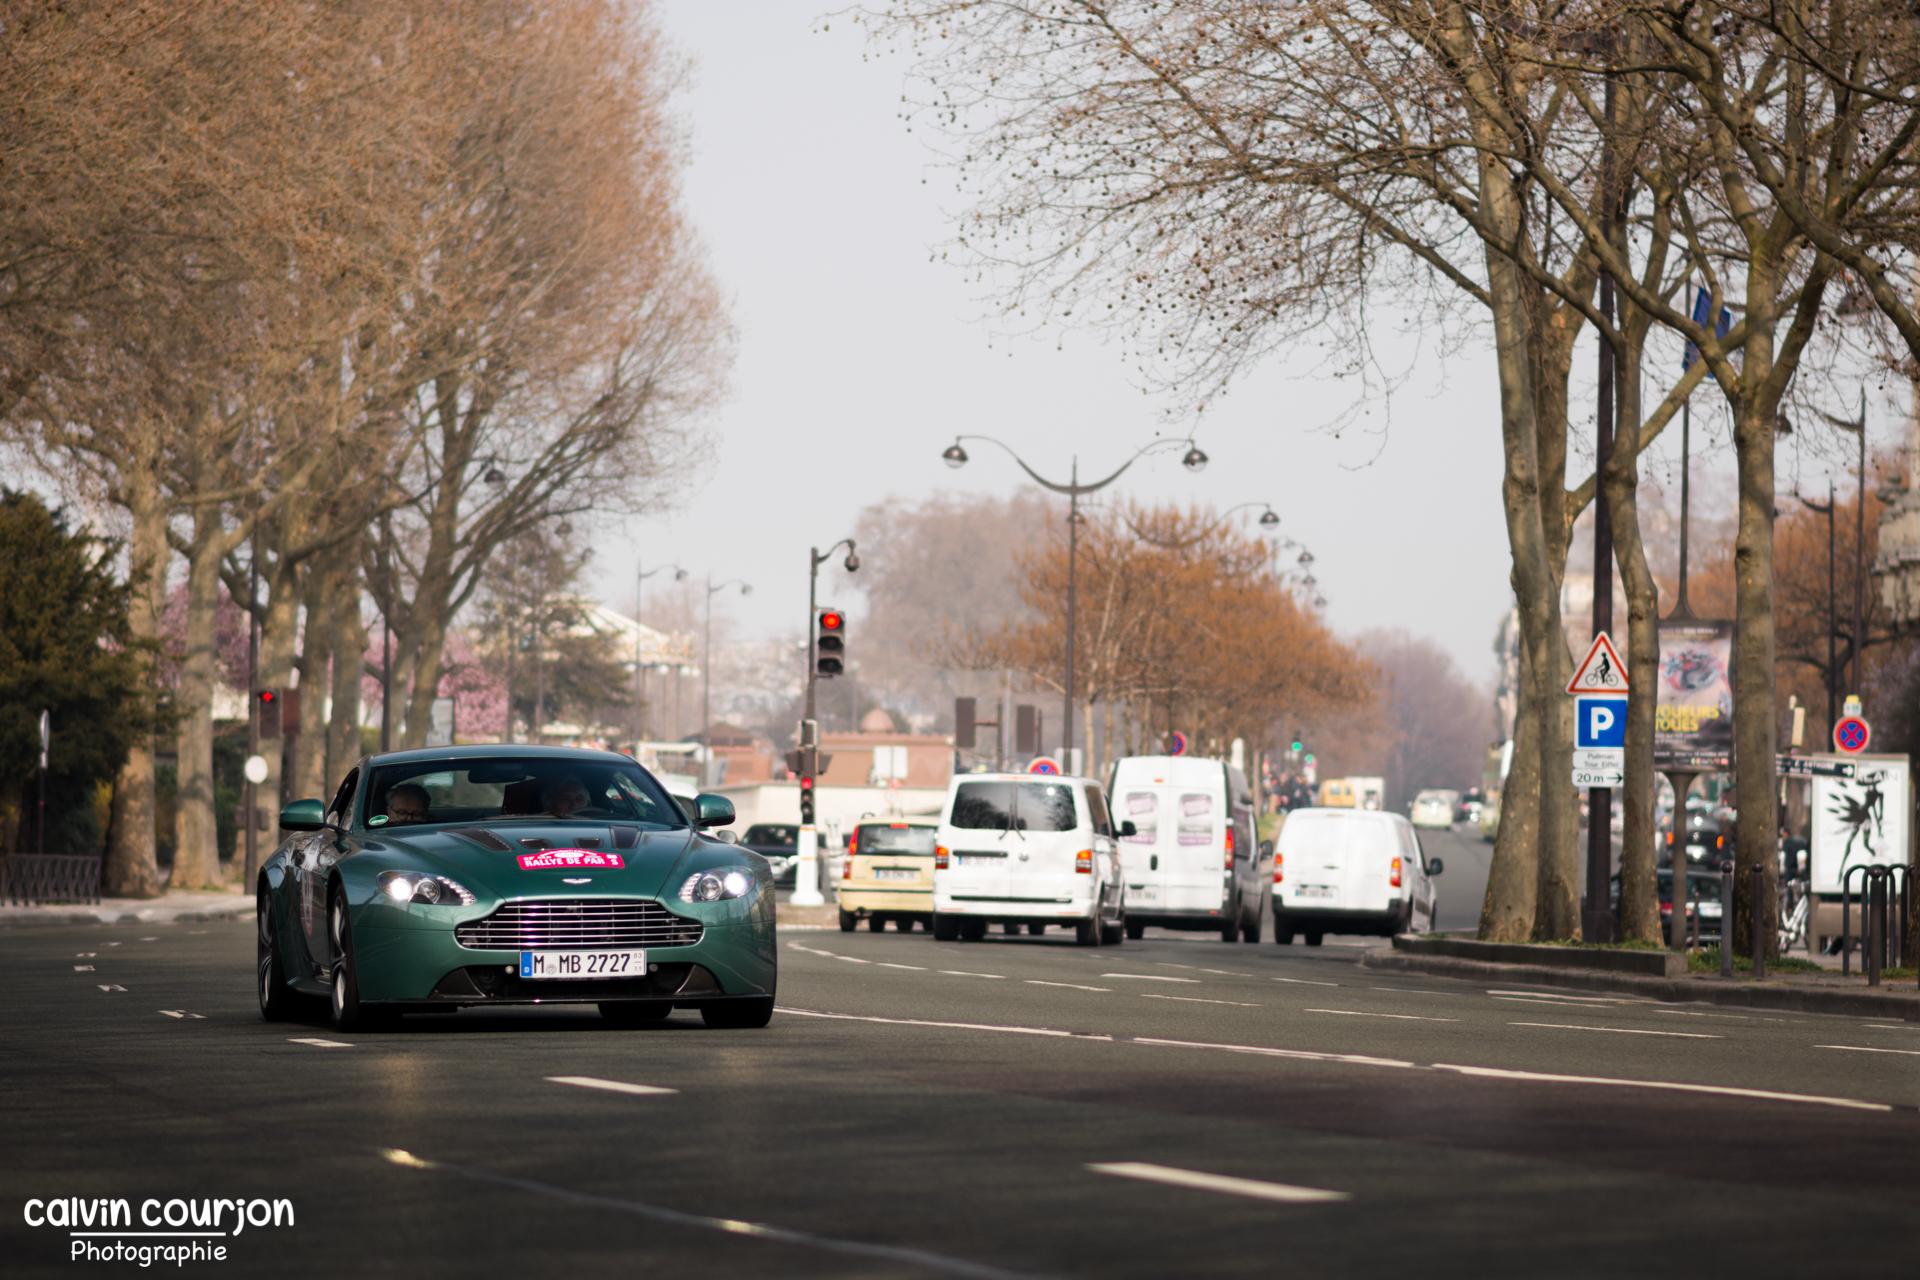 Aston Martin V12 Vantage - Rallye Paris 2015 - Calvin Courjon Photographie